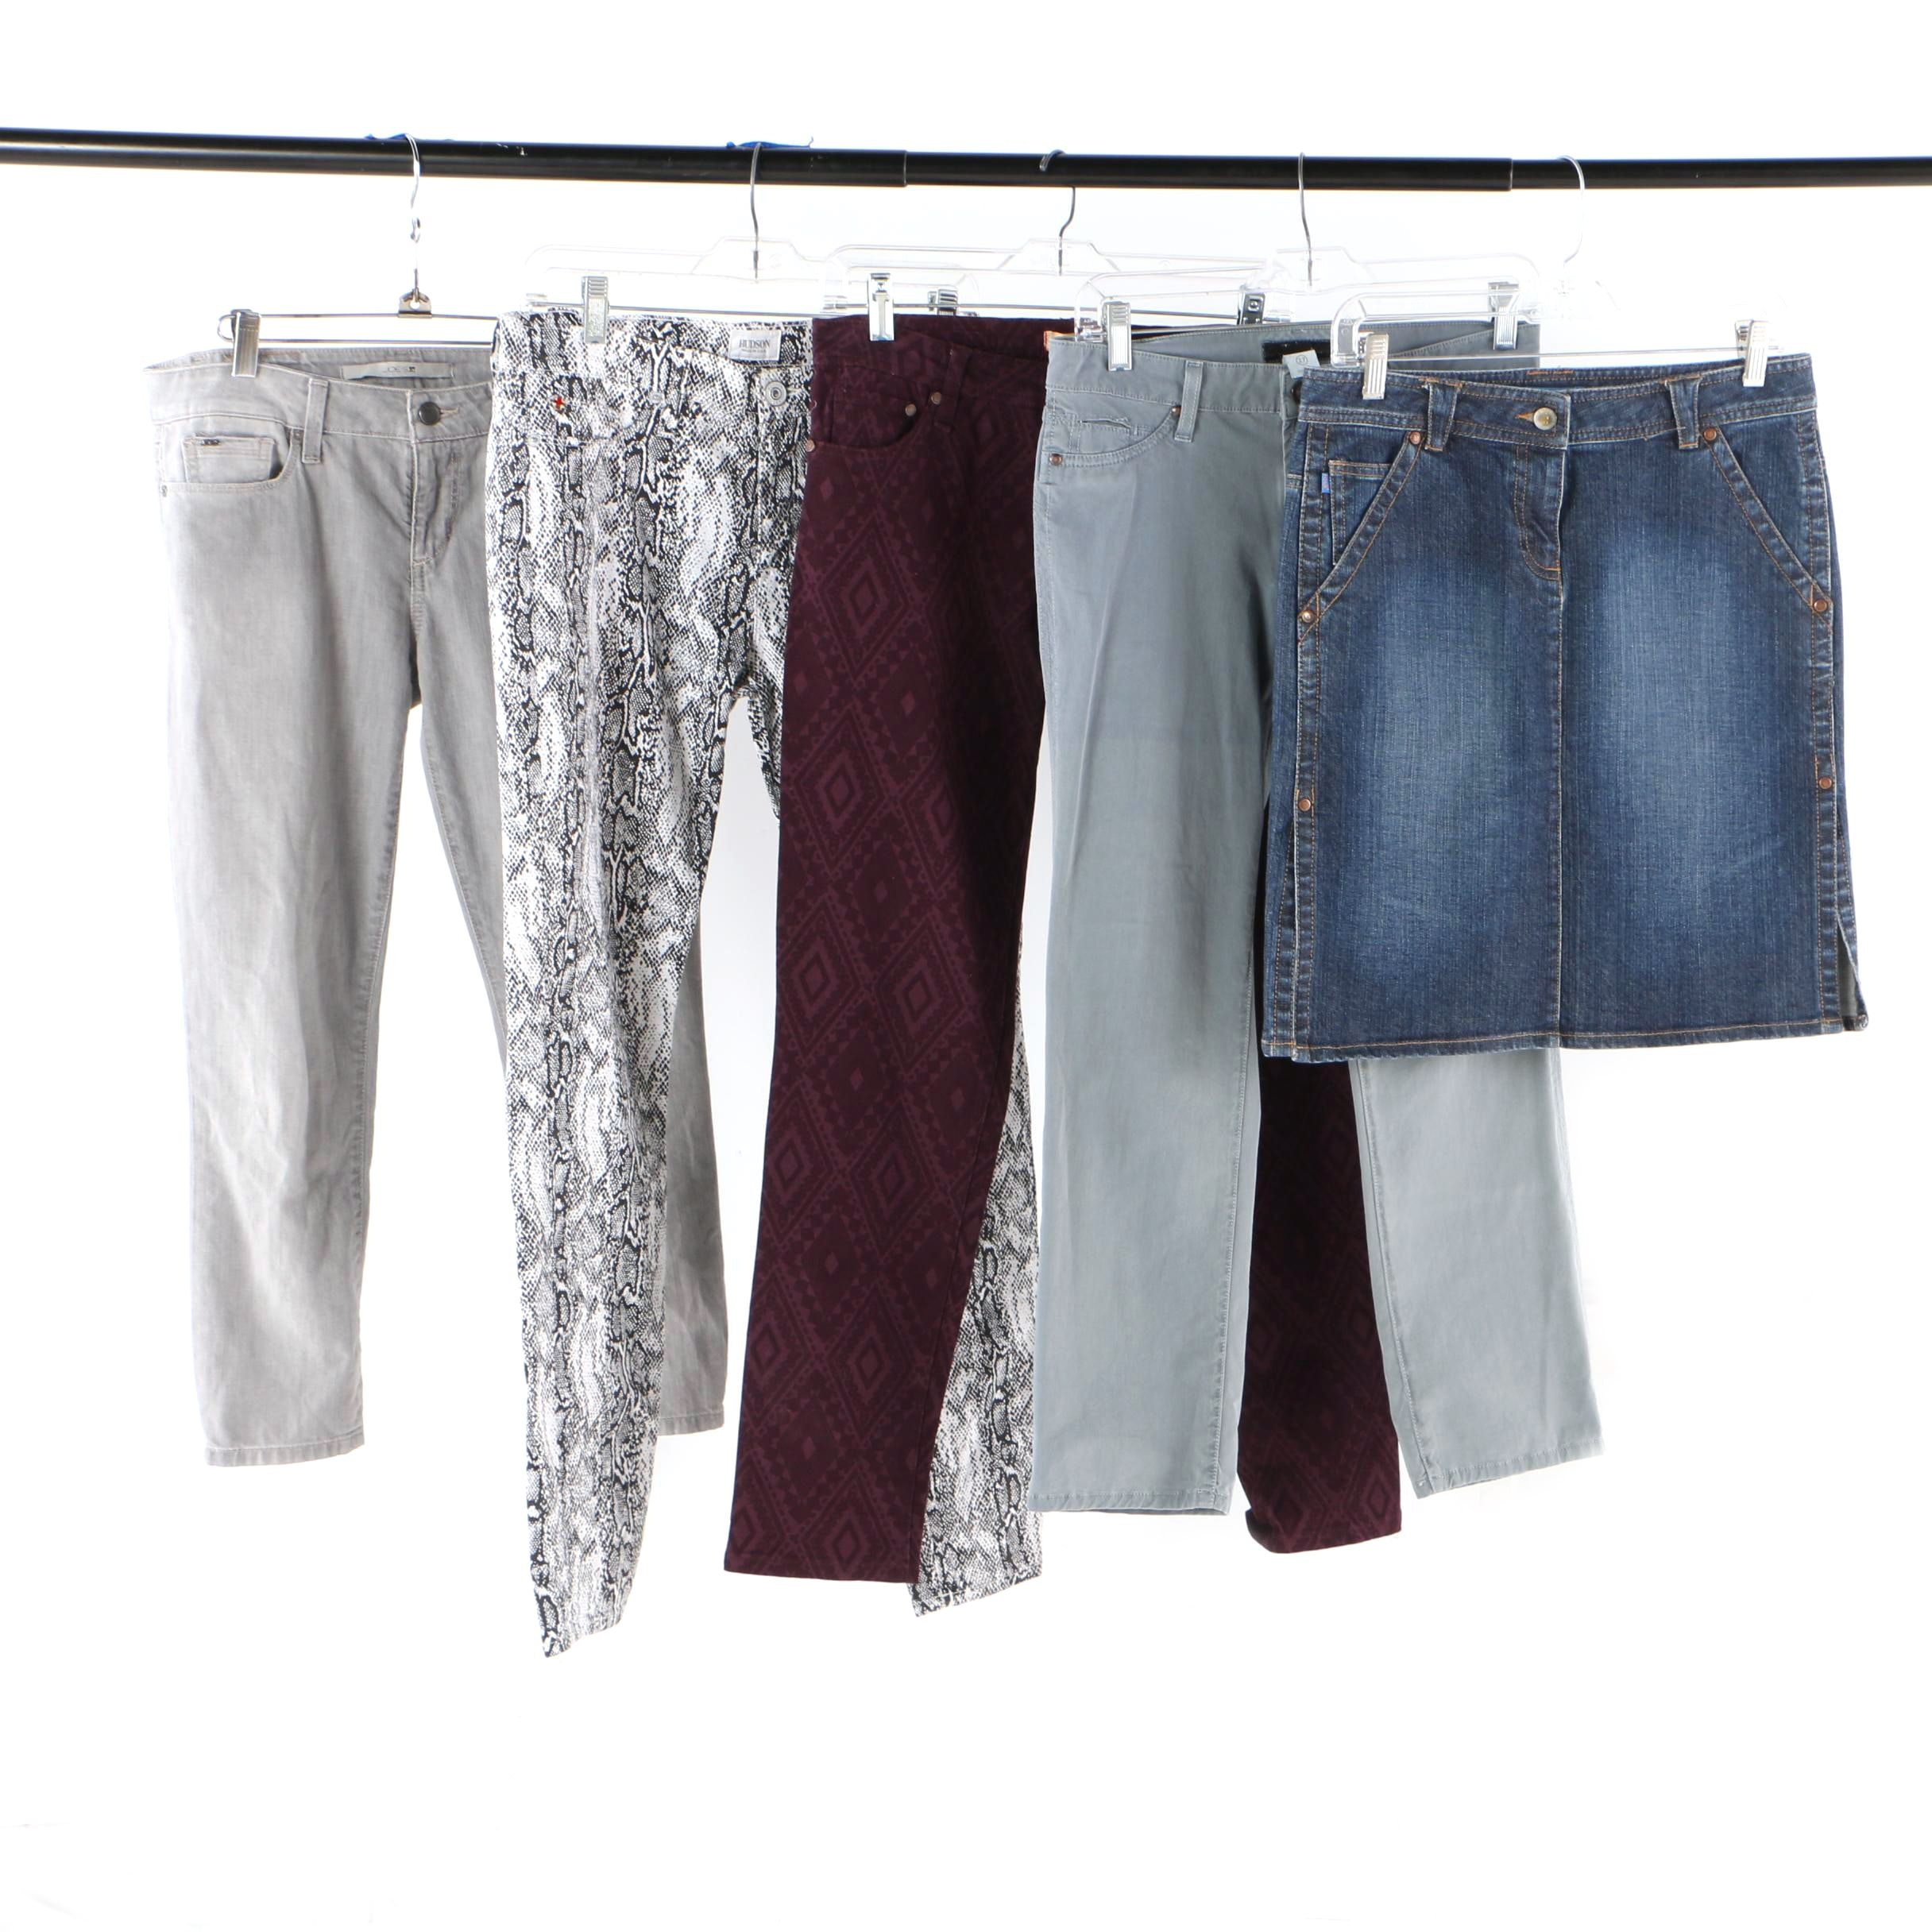 Designer Pants with Joe's, Hudson, Sanctuary, Tag Elements and Fcuk Denim Skirt